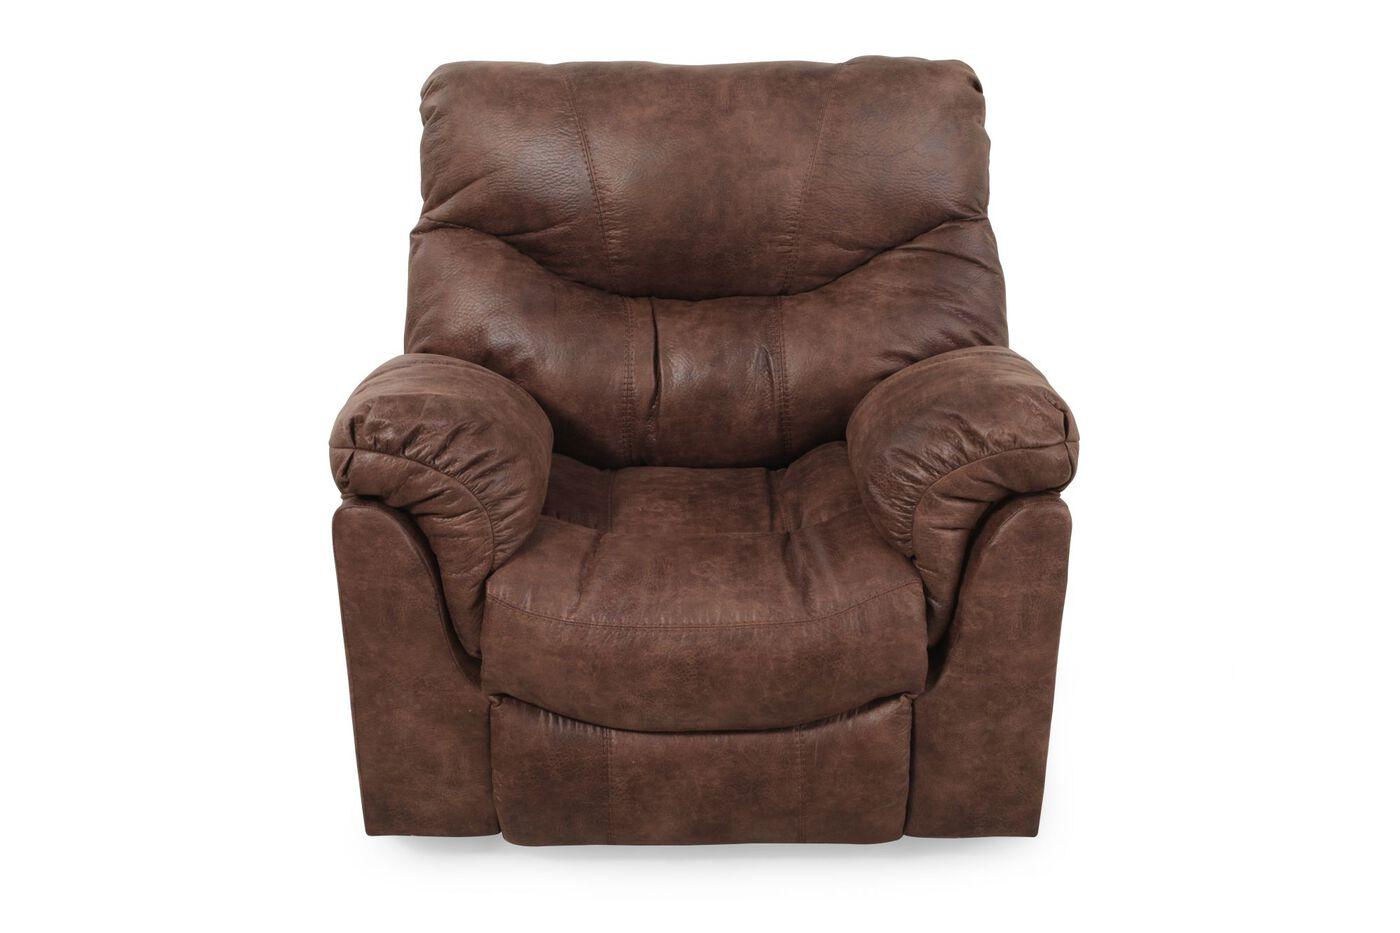 Ashley Alzena Gunsmoke Recliner Mathis Brothers Furniture